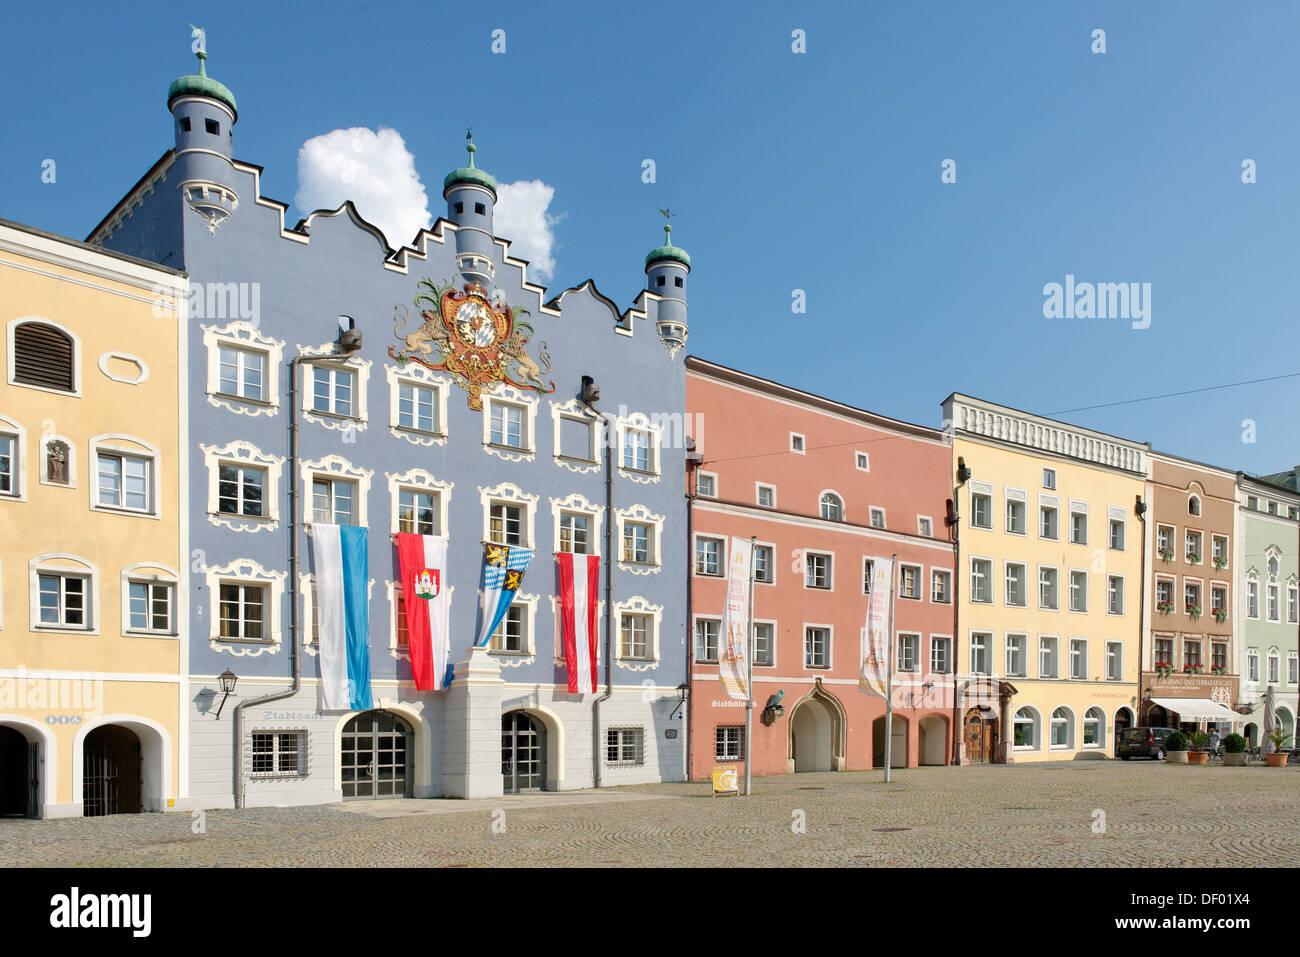 City hall, former seat of the Electoral Bavarian government, Stadtplatz square, Burghausen, Upper Bavaria, Bavaria - Stock Image